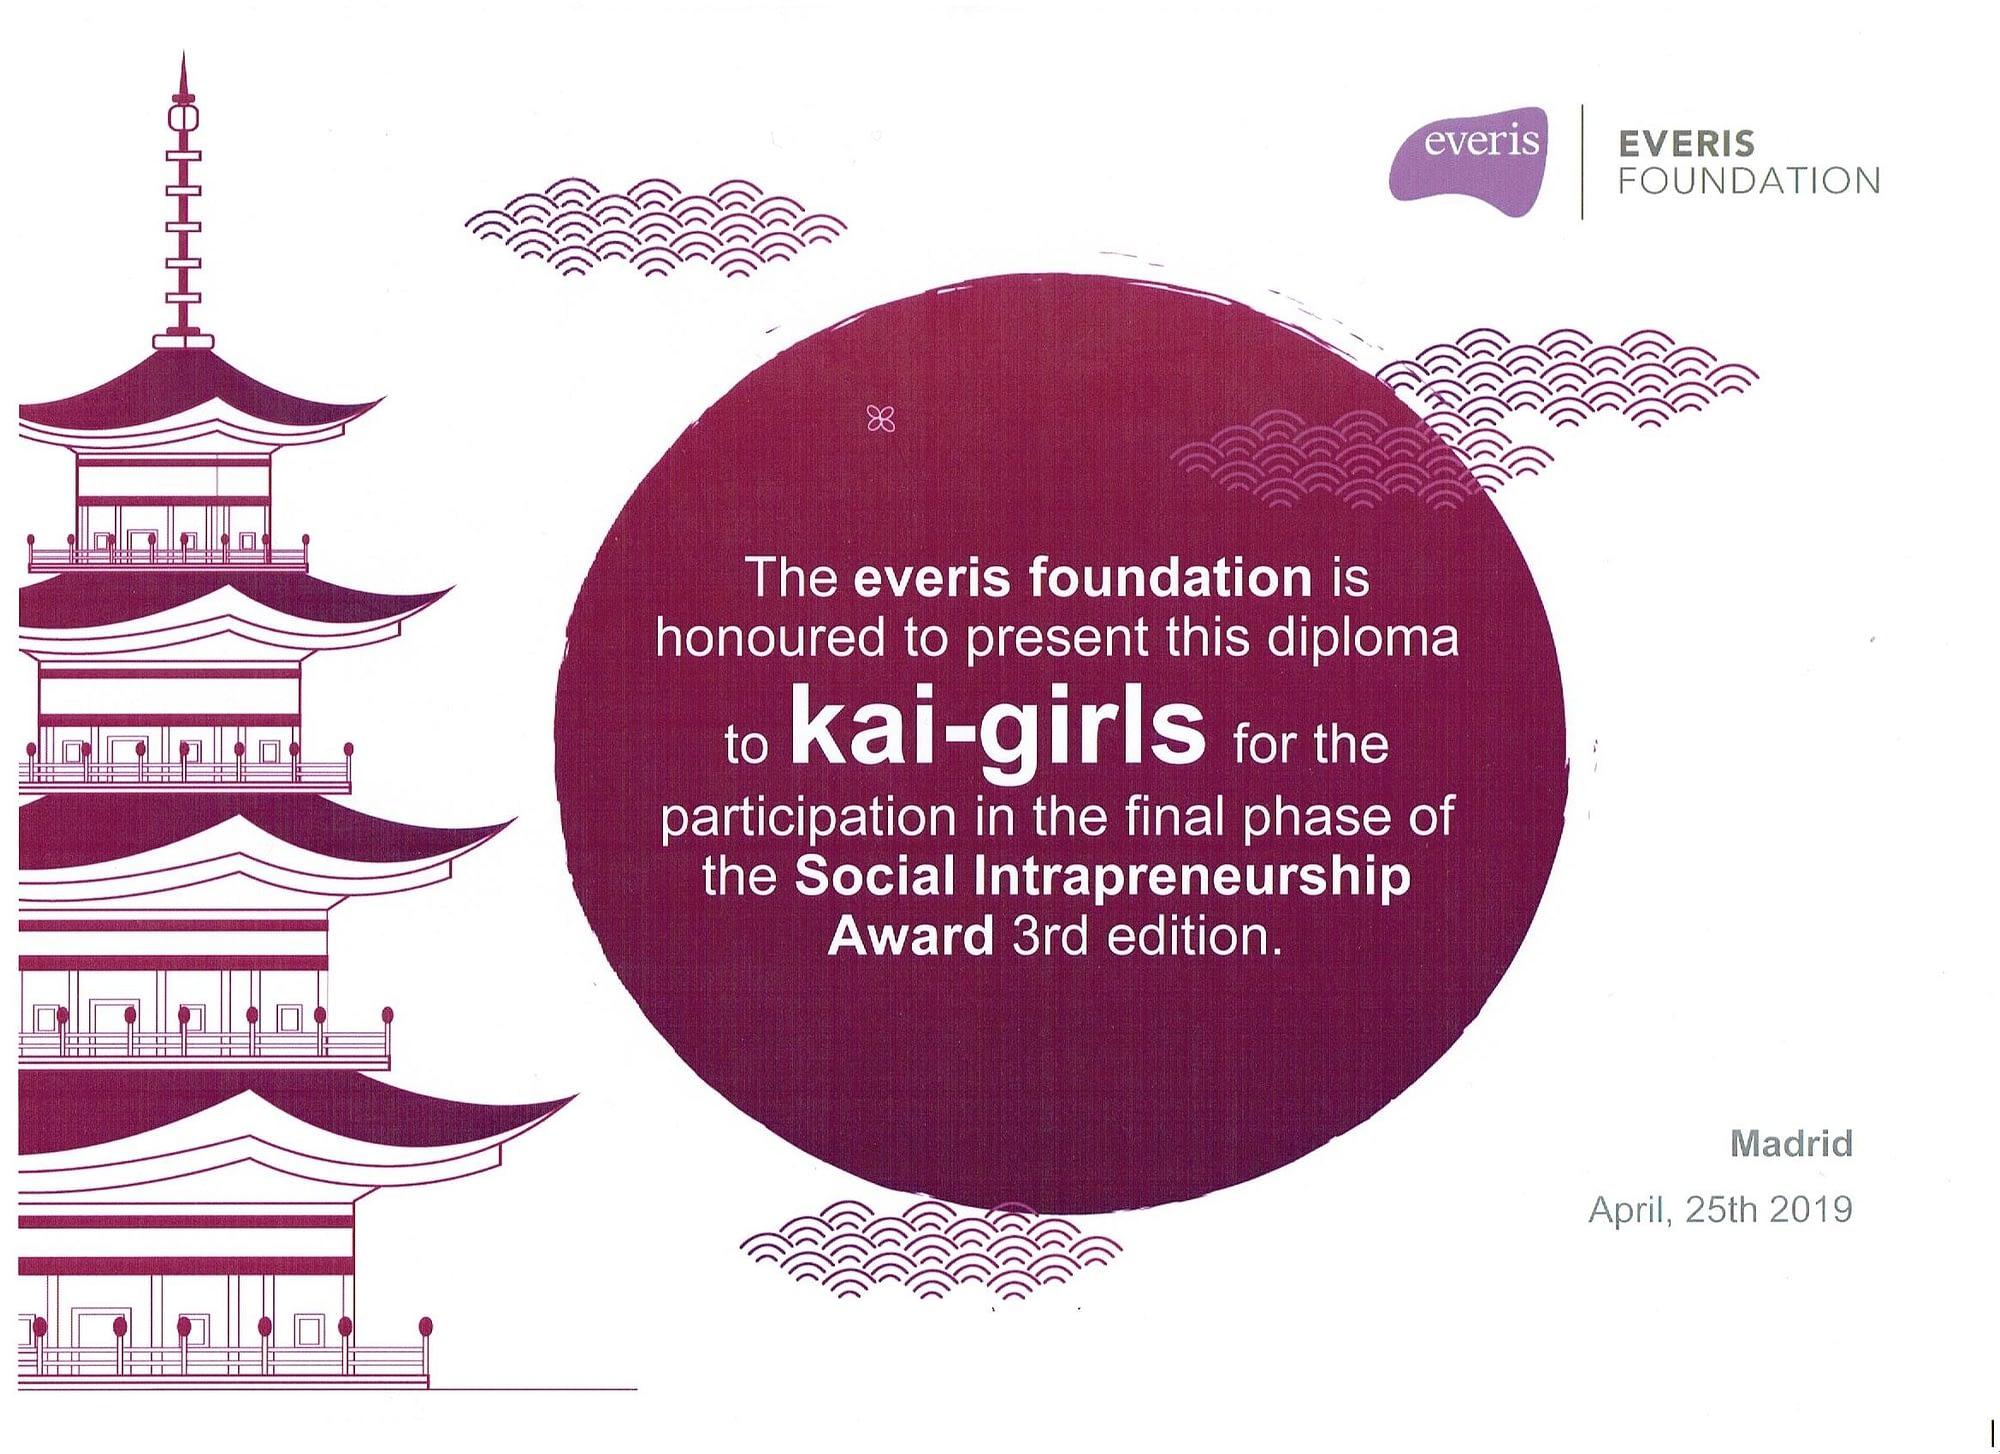 kai-girls